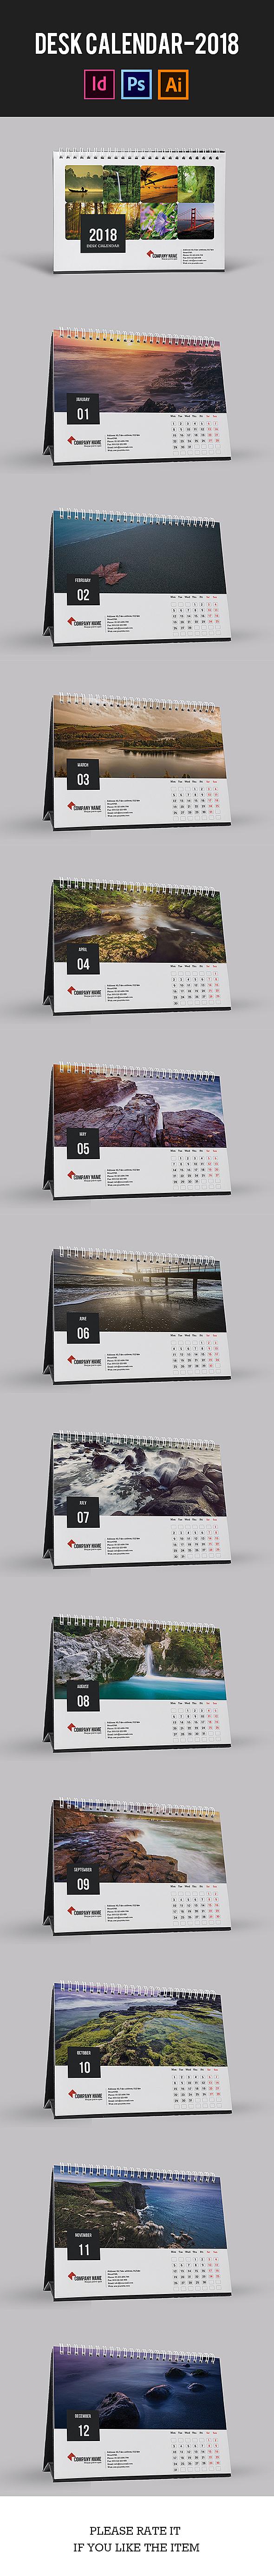 Desk Calendar for 2018 | Updated